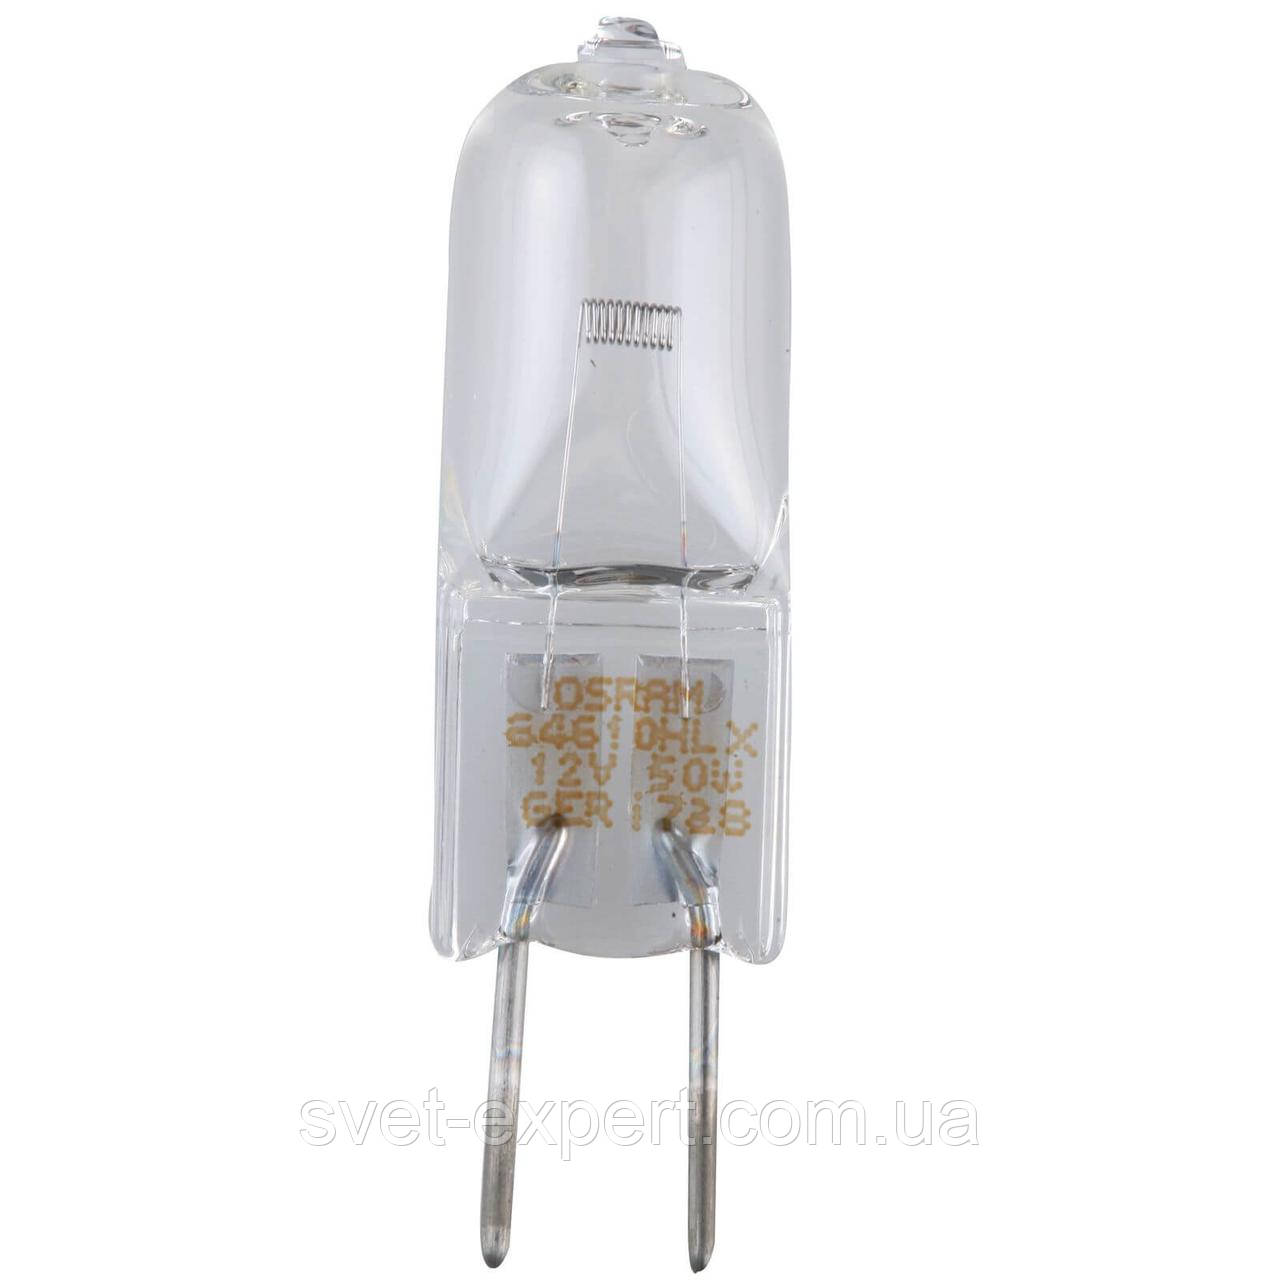 Лампа 64610 HLX 50W 12V G6.35 BRL 40x1 OSRAM